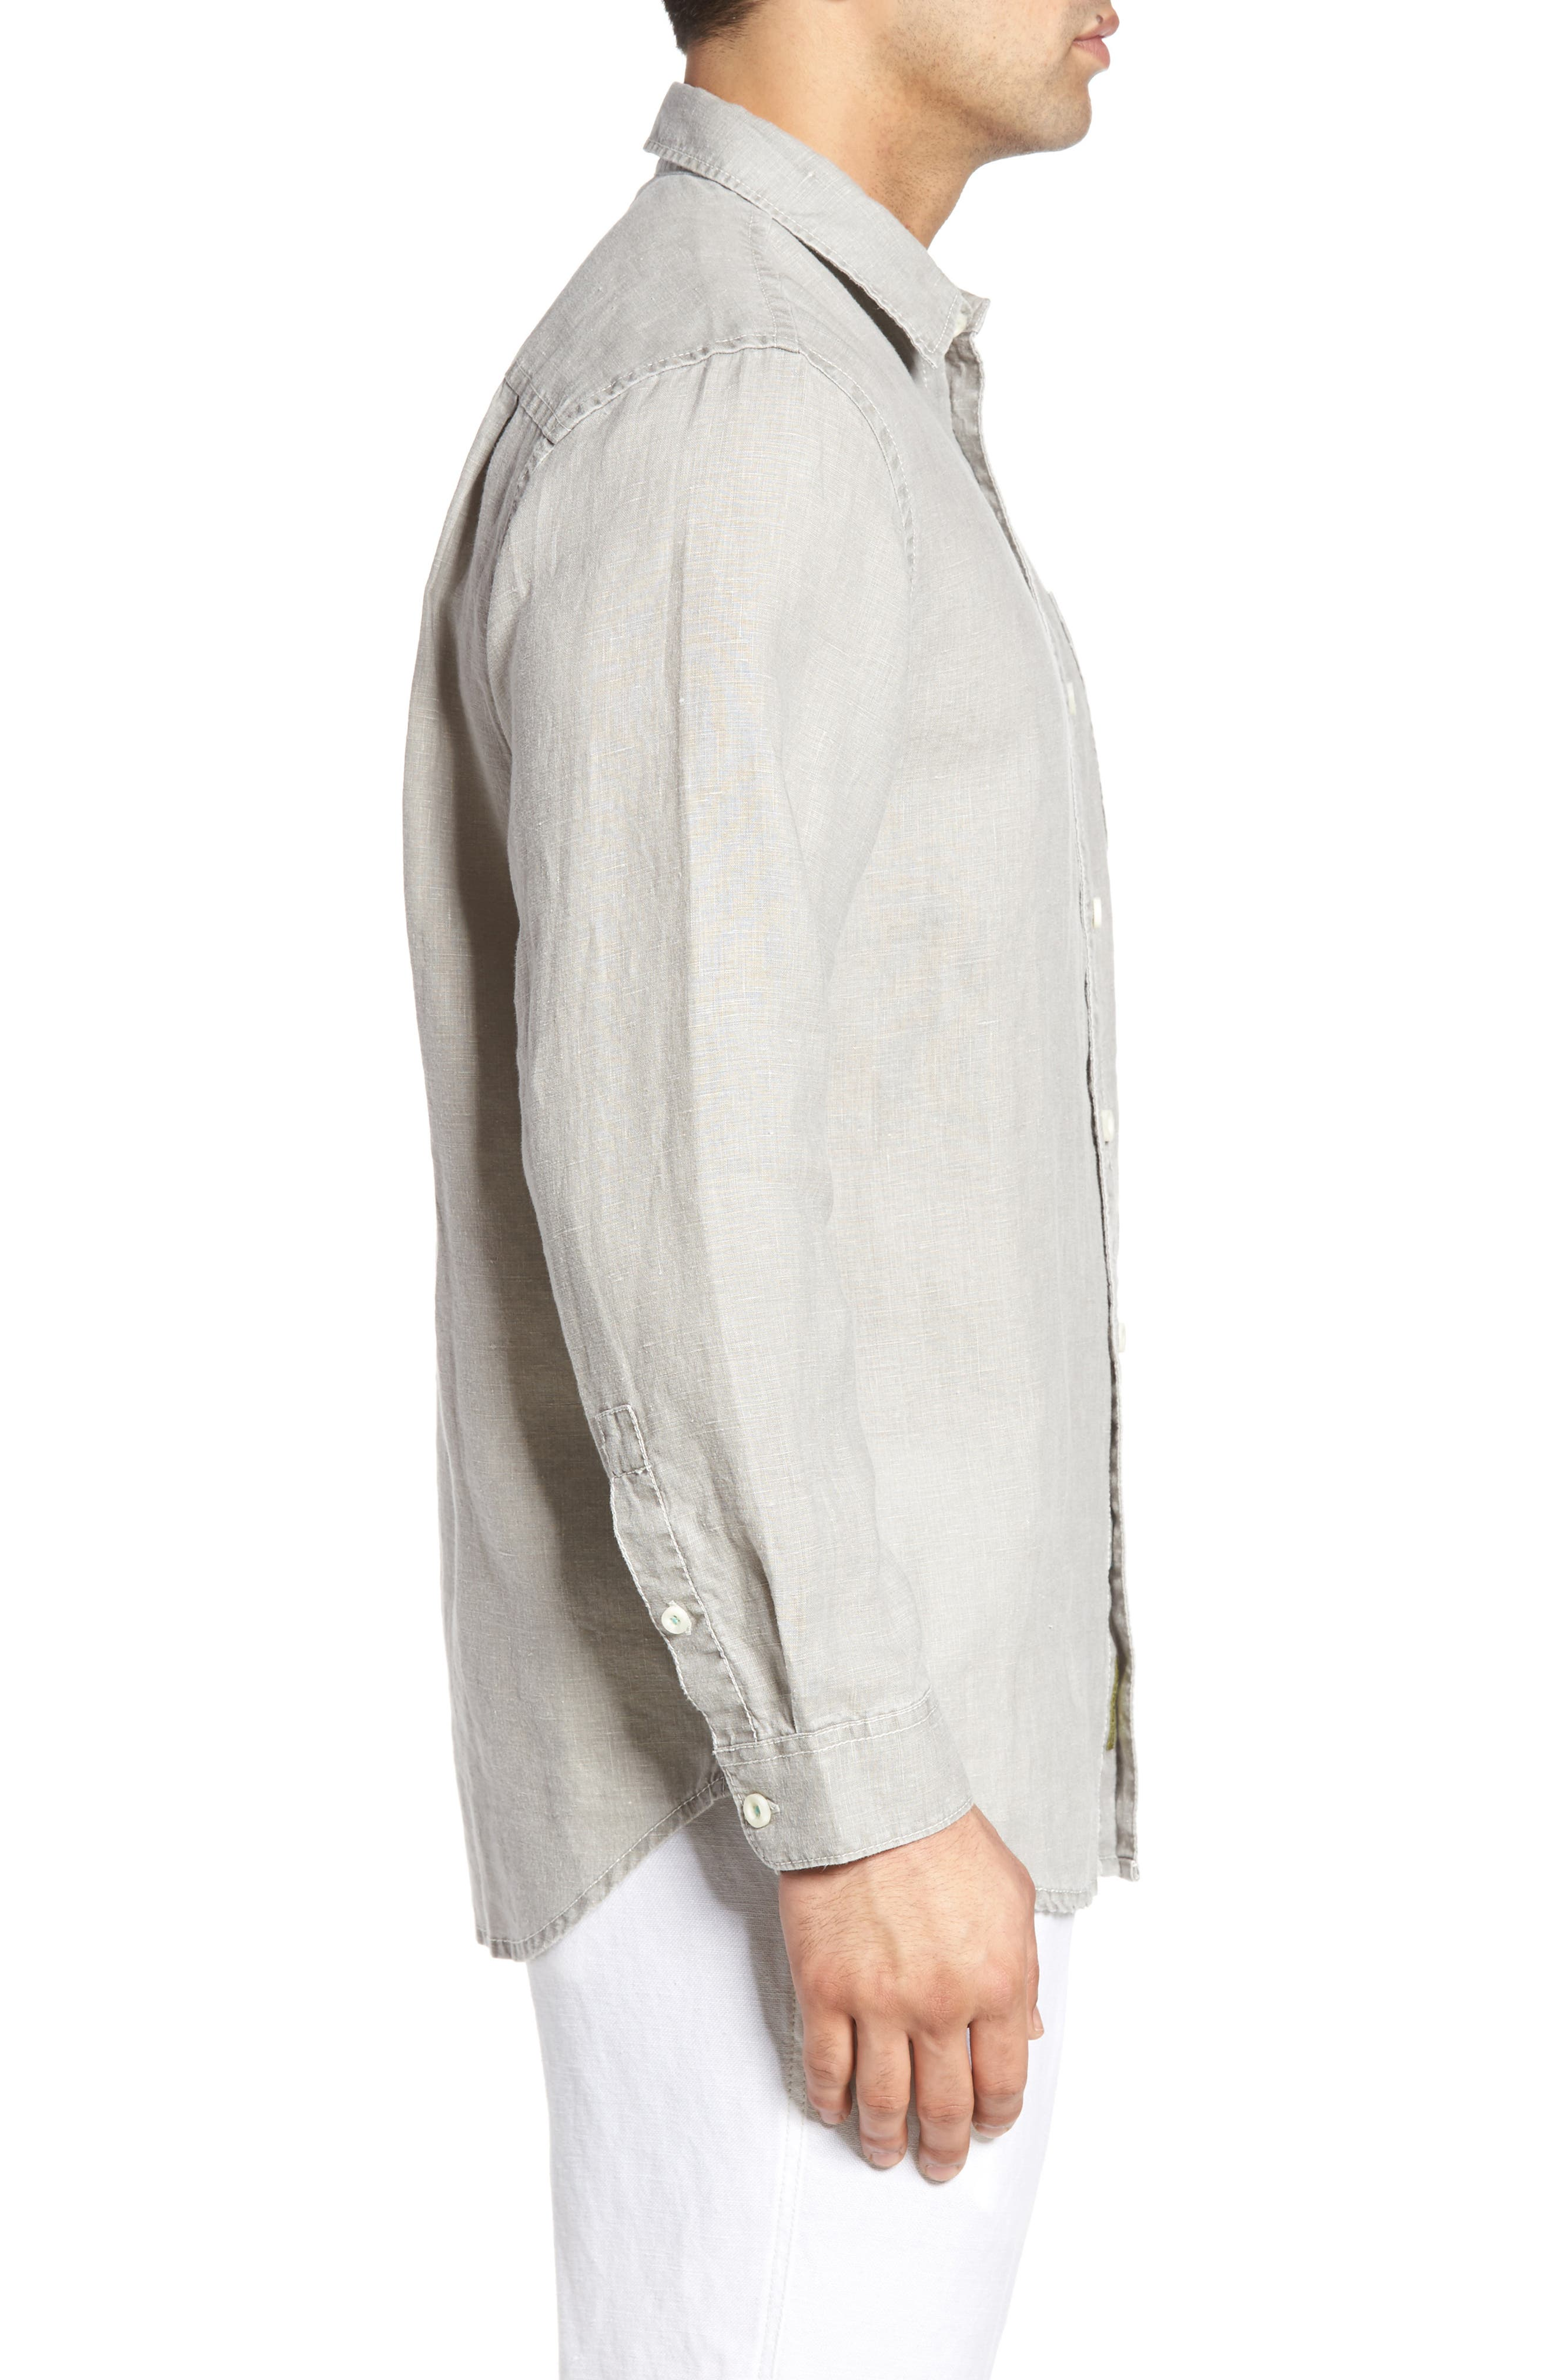 TOMMY BAHAMA, 'Sea Glass Breezer' Original Fit Linen Shirt, Alternate thumbnail 3, color, LIGHT GREY